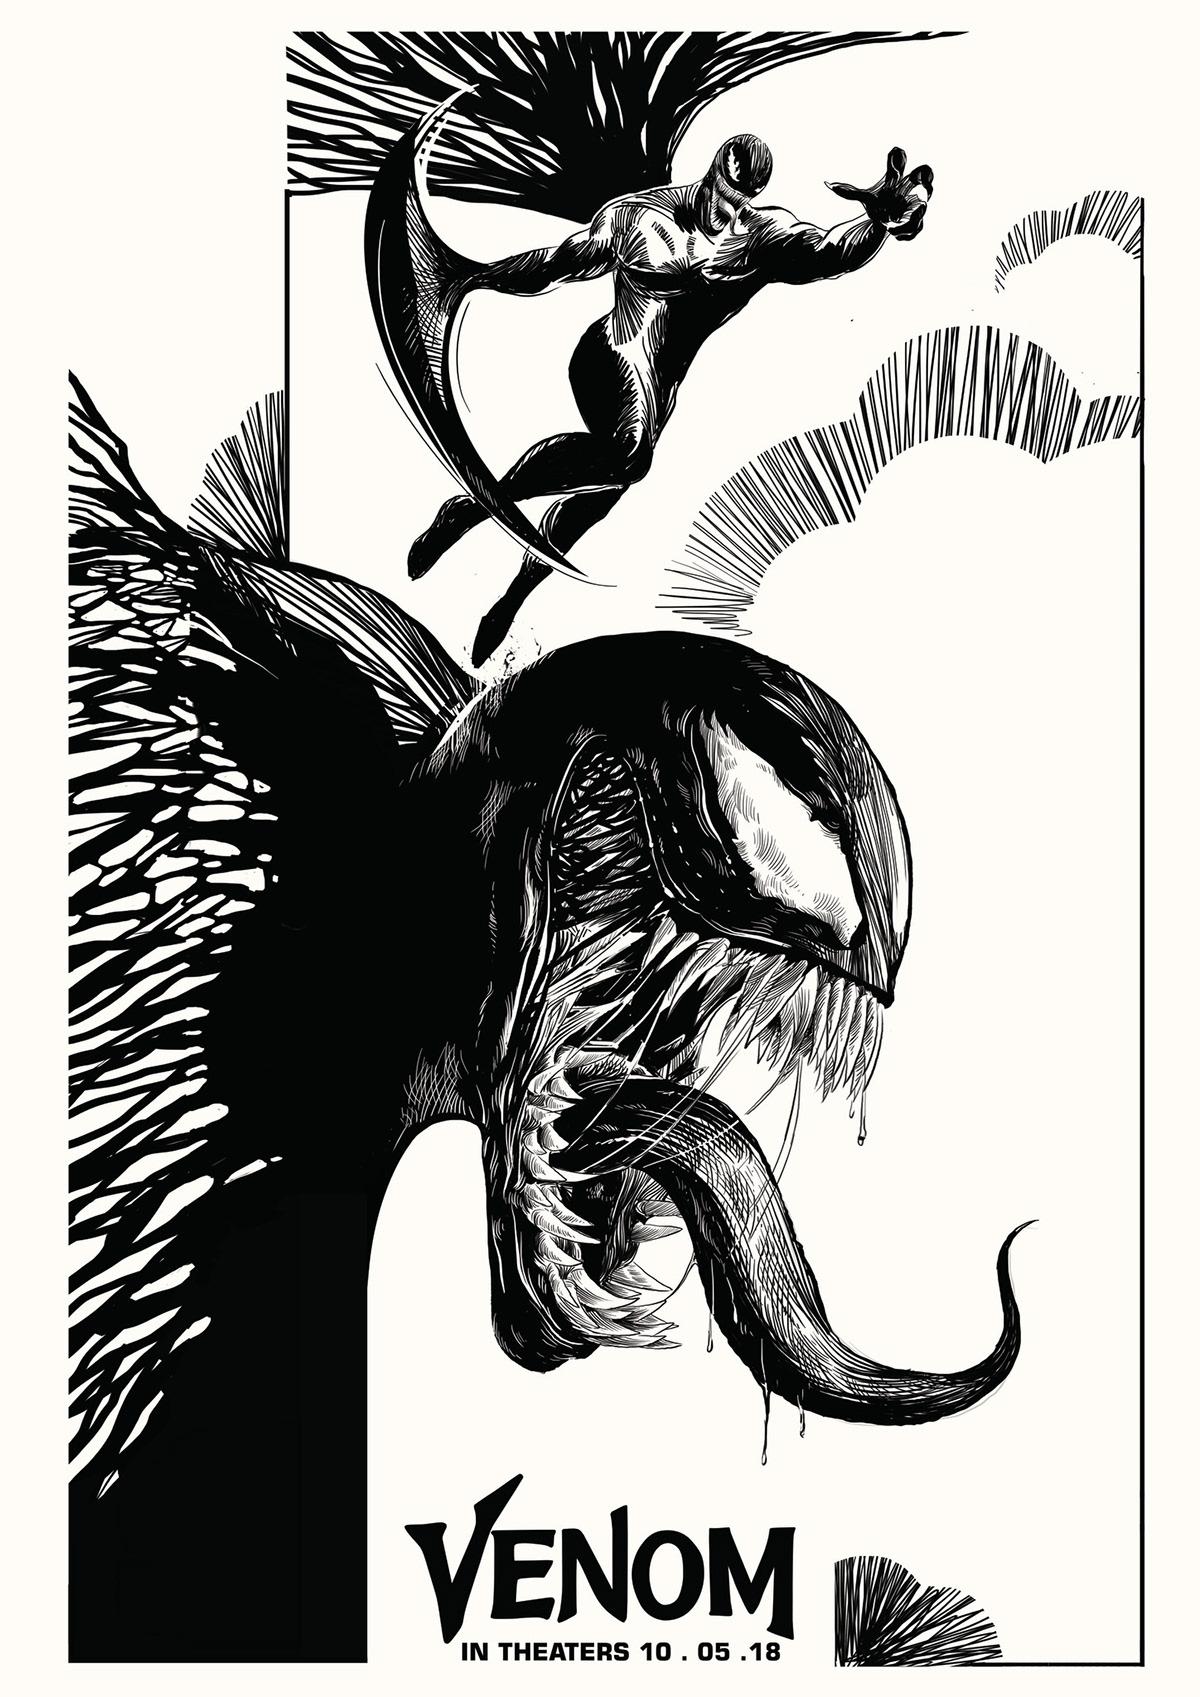 ILLUSTRATION  Poster Design fanart Movie Posters graphic design  artwork Drawing  art